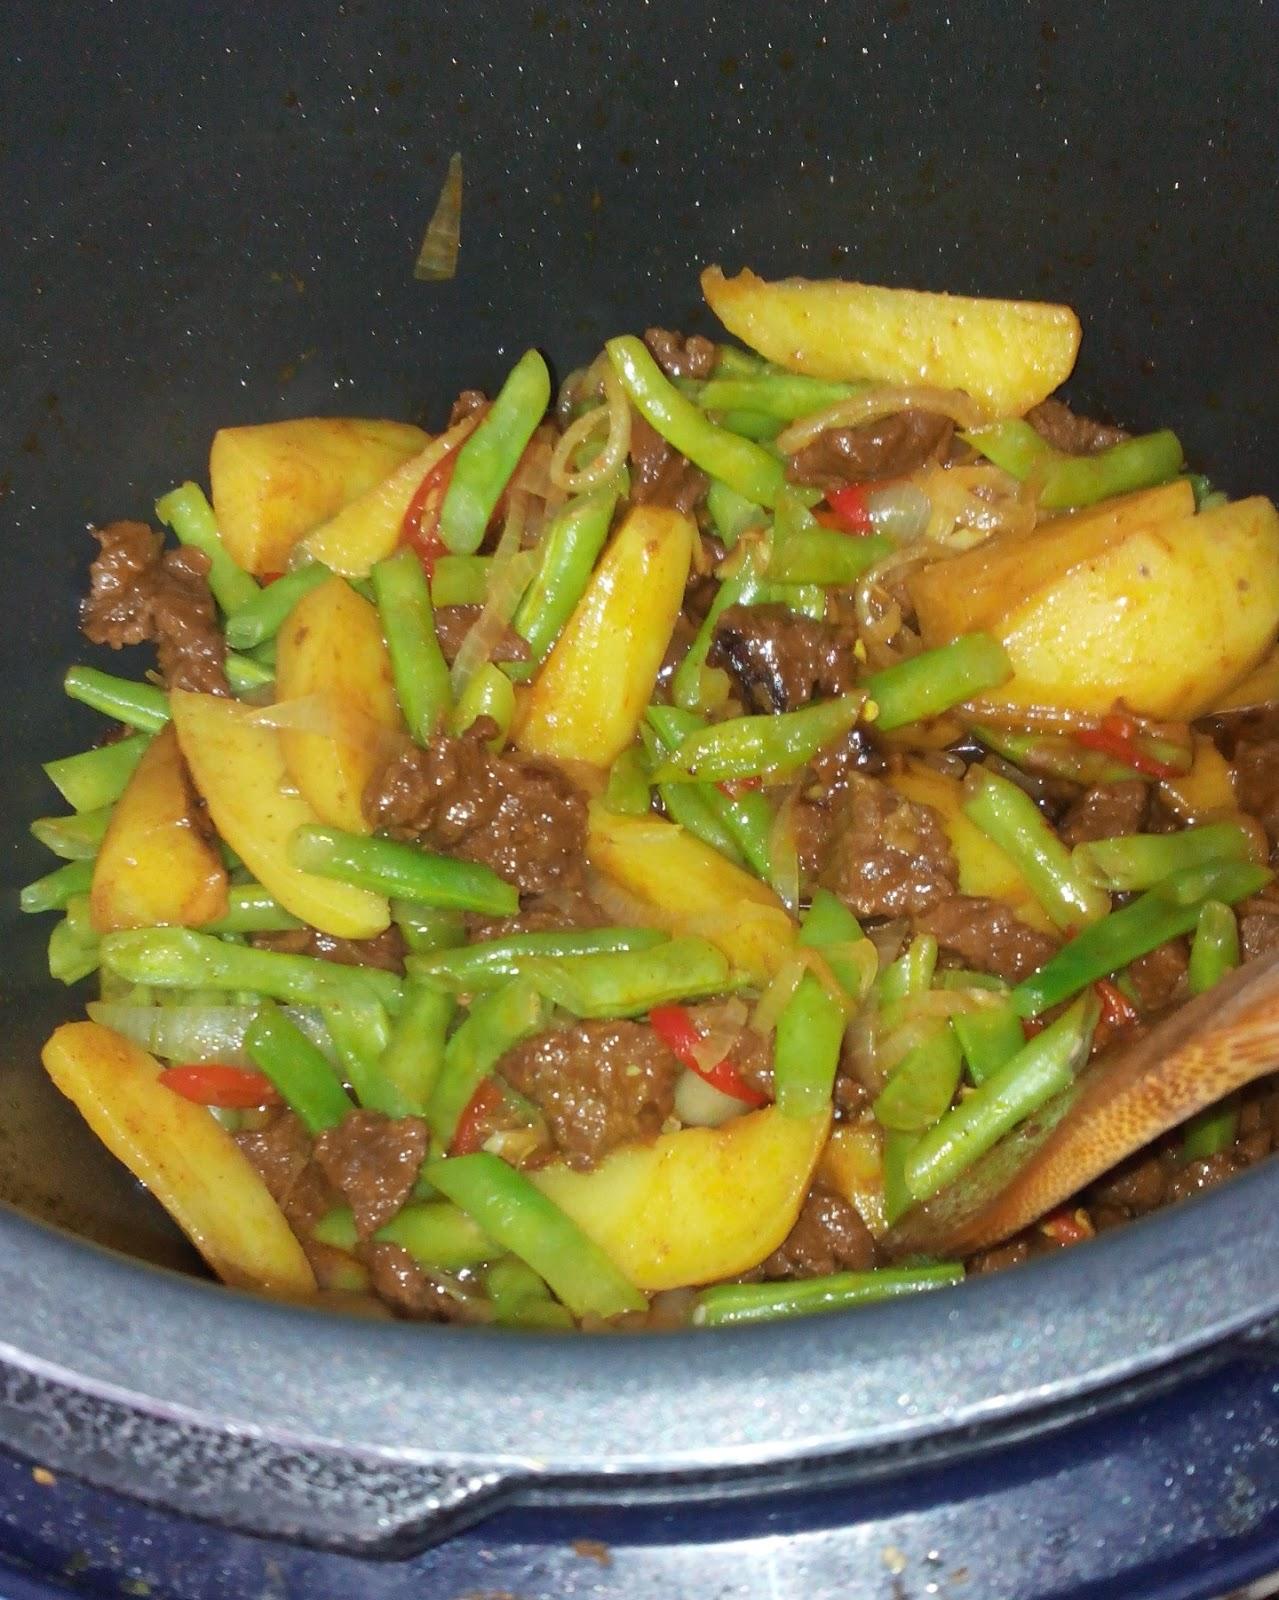 Kitchen Mak Tok Sajian Dapur Bonda Resepi Periuk Noxxa Daging Goreng Kunyit Campur Kentang Dan Buncis